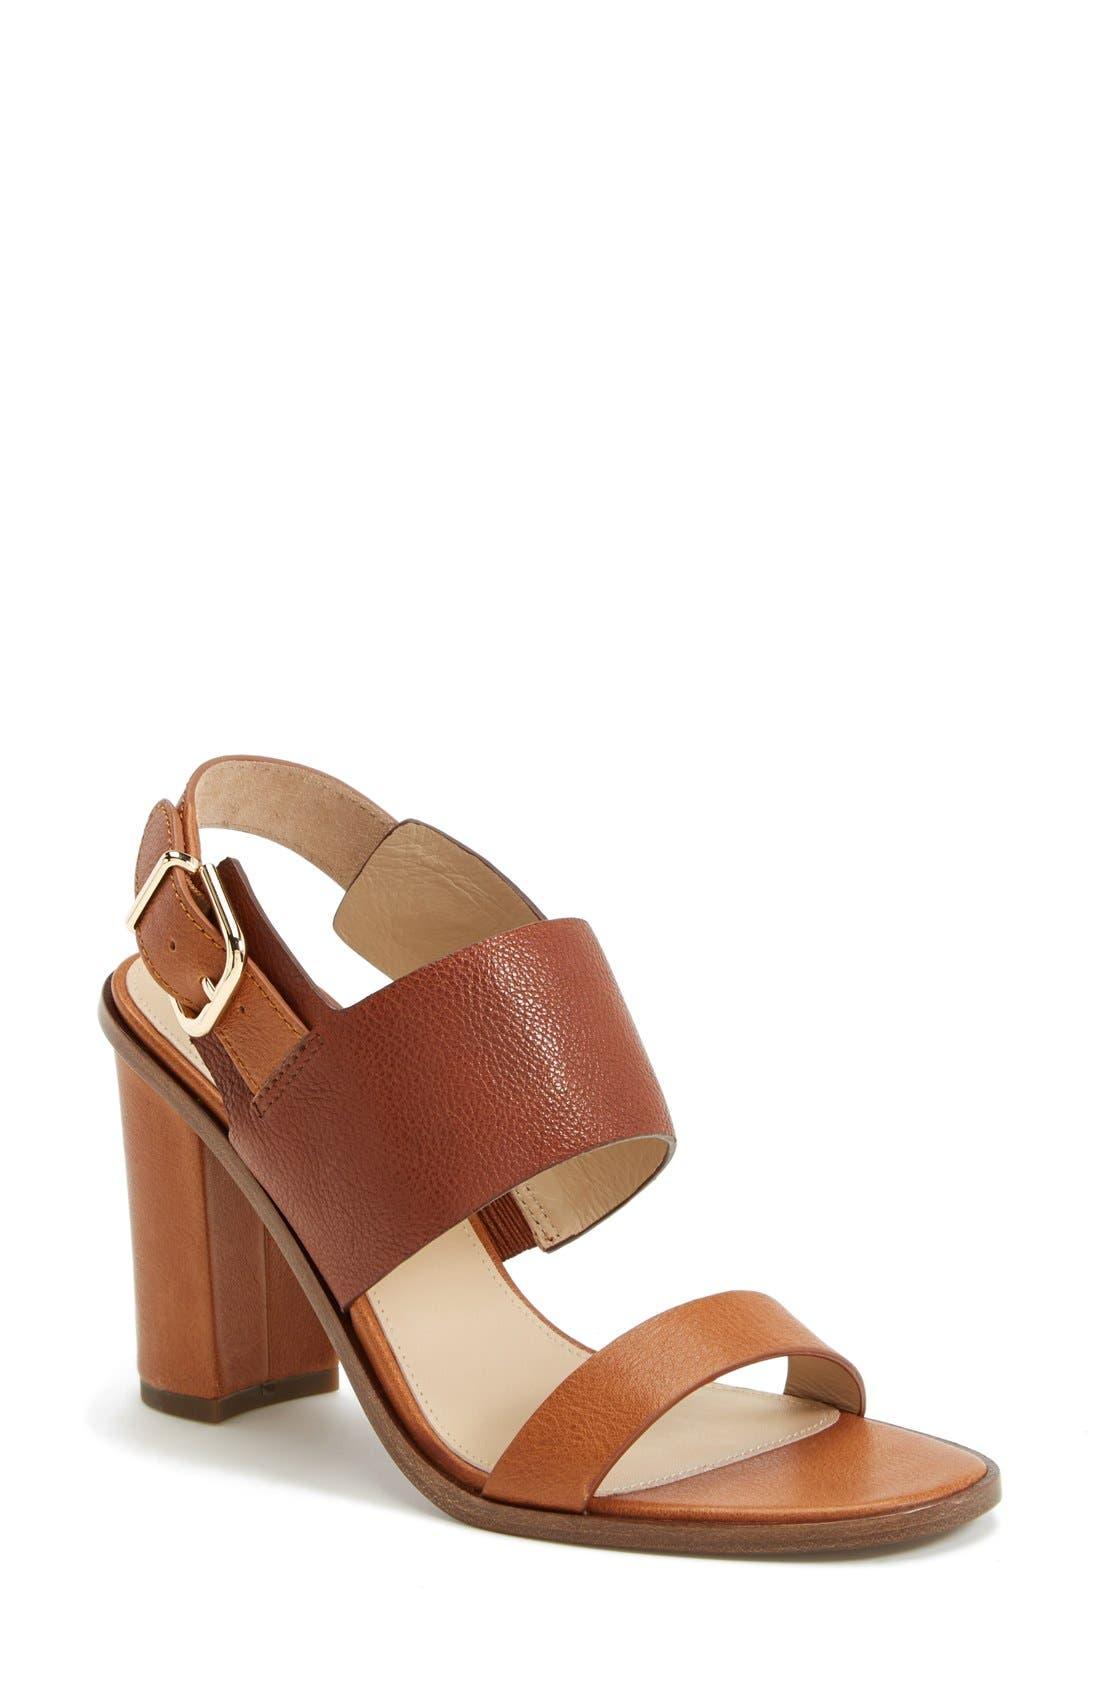 Alternate Image 1 Selected - Via Spiga 'Baris' Leather Slingback Sandal (Women) (Nordstrom Exclusive)